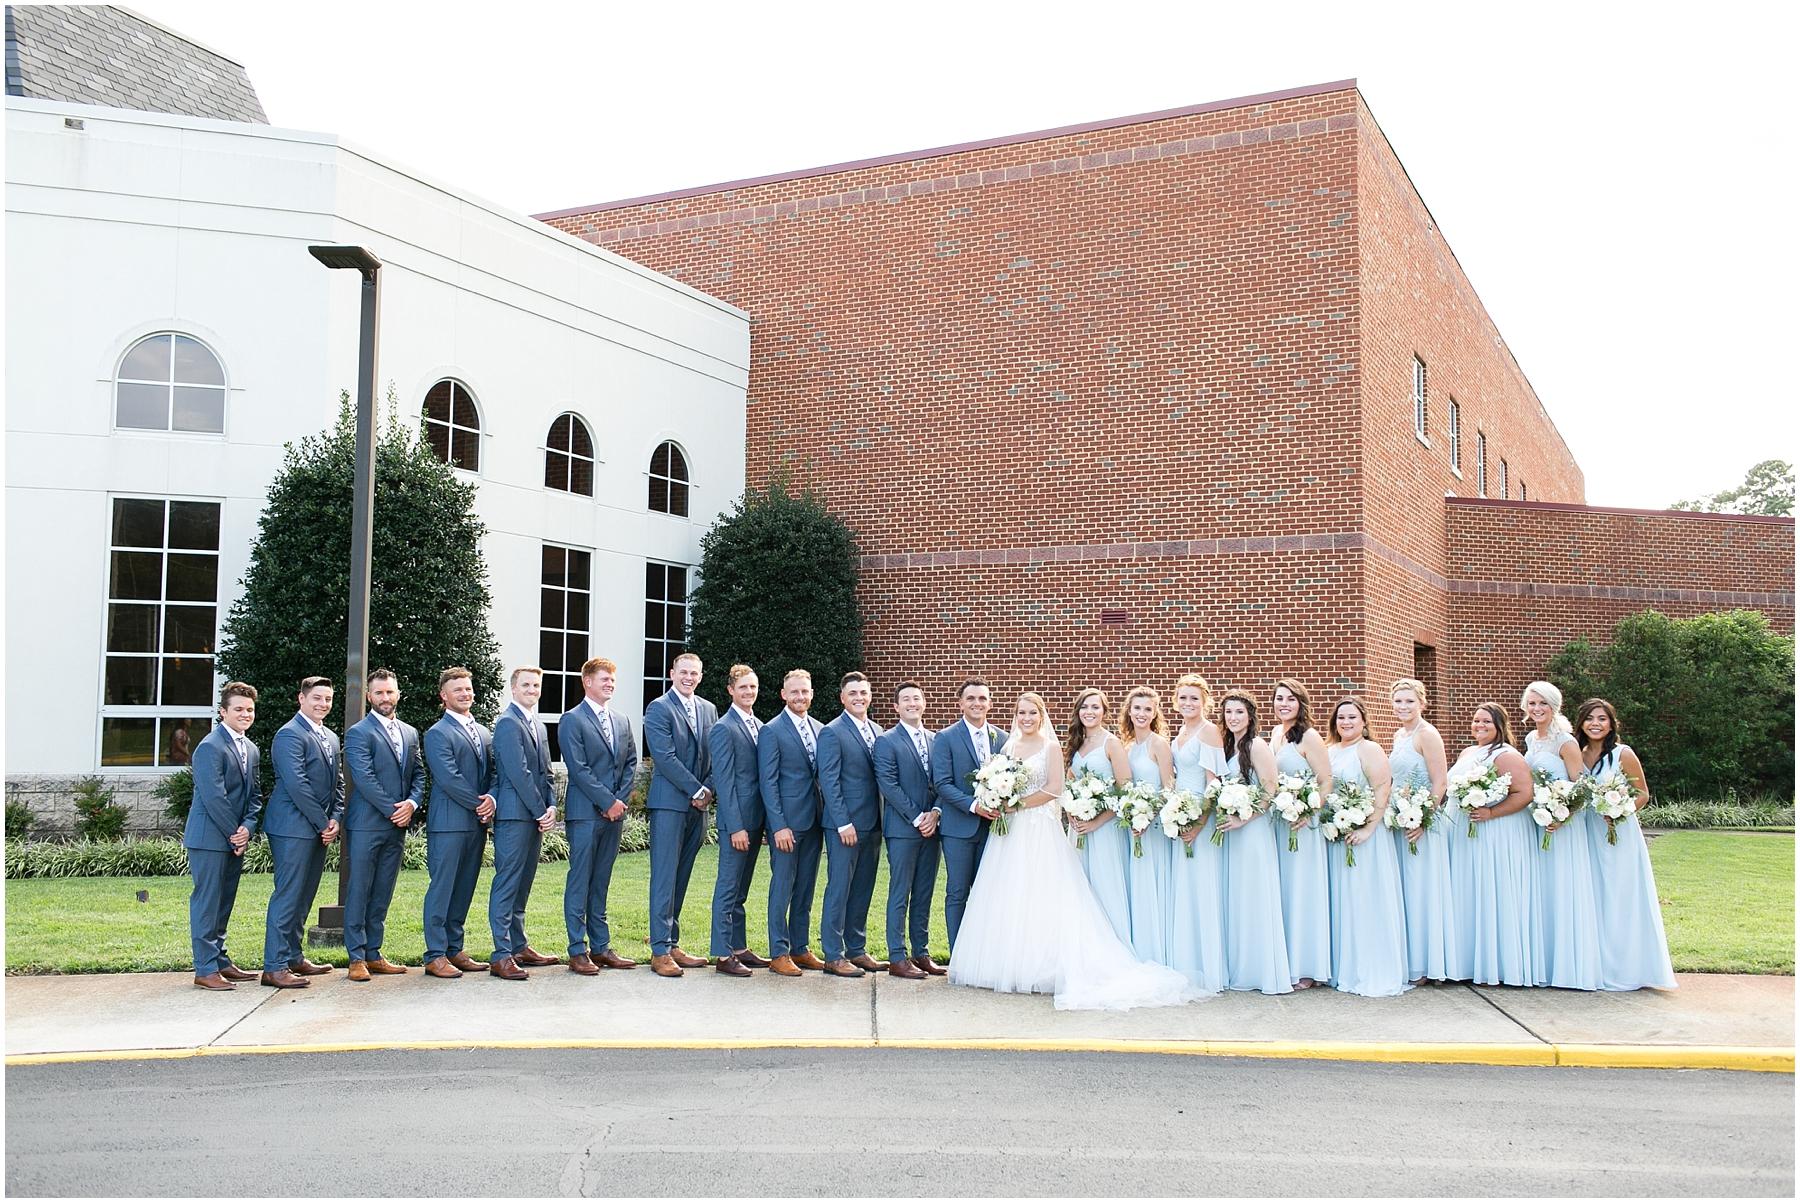 virginia beach wedding photography,here and now bridal wedding dress, jessica ryan photography, jessica ryan photographer, redeemer church, bridal party portraits